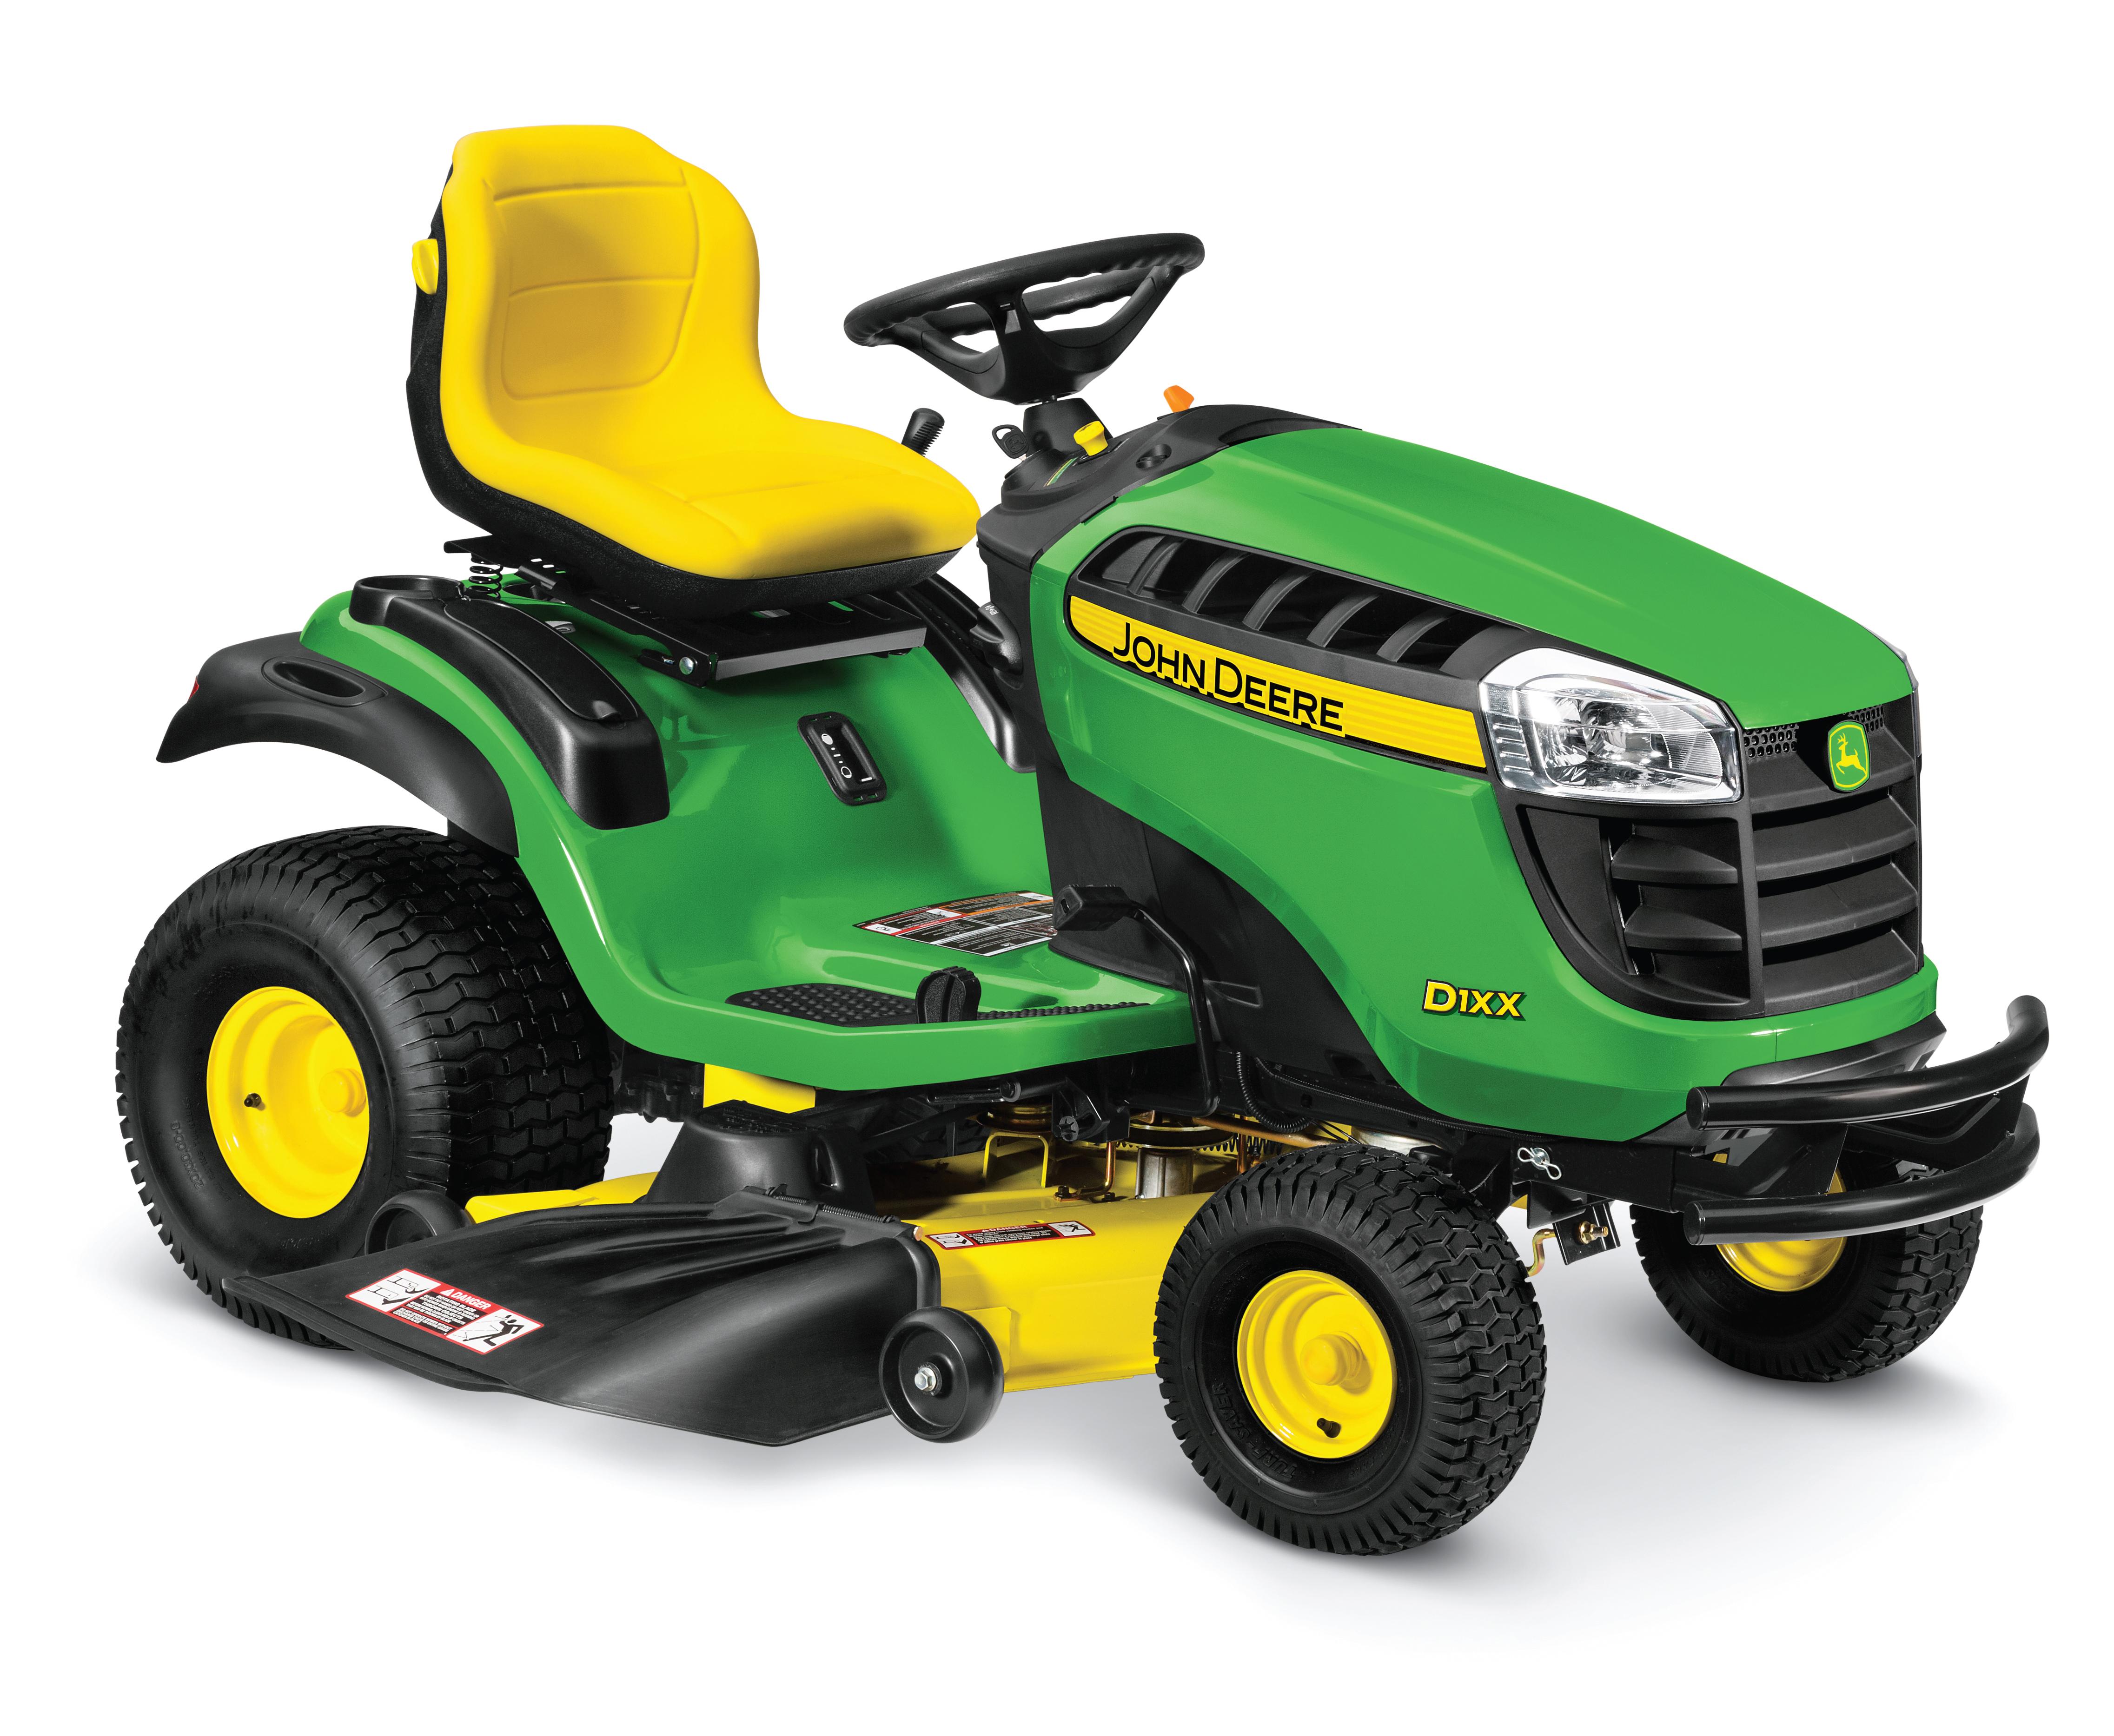 John Deere Lawn Tractor : John deere recalls riding lawn tractors due to crash